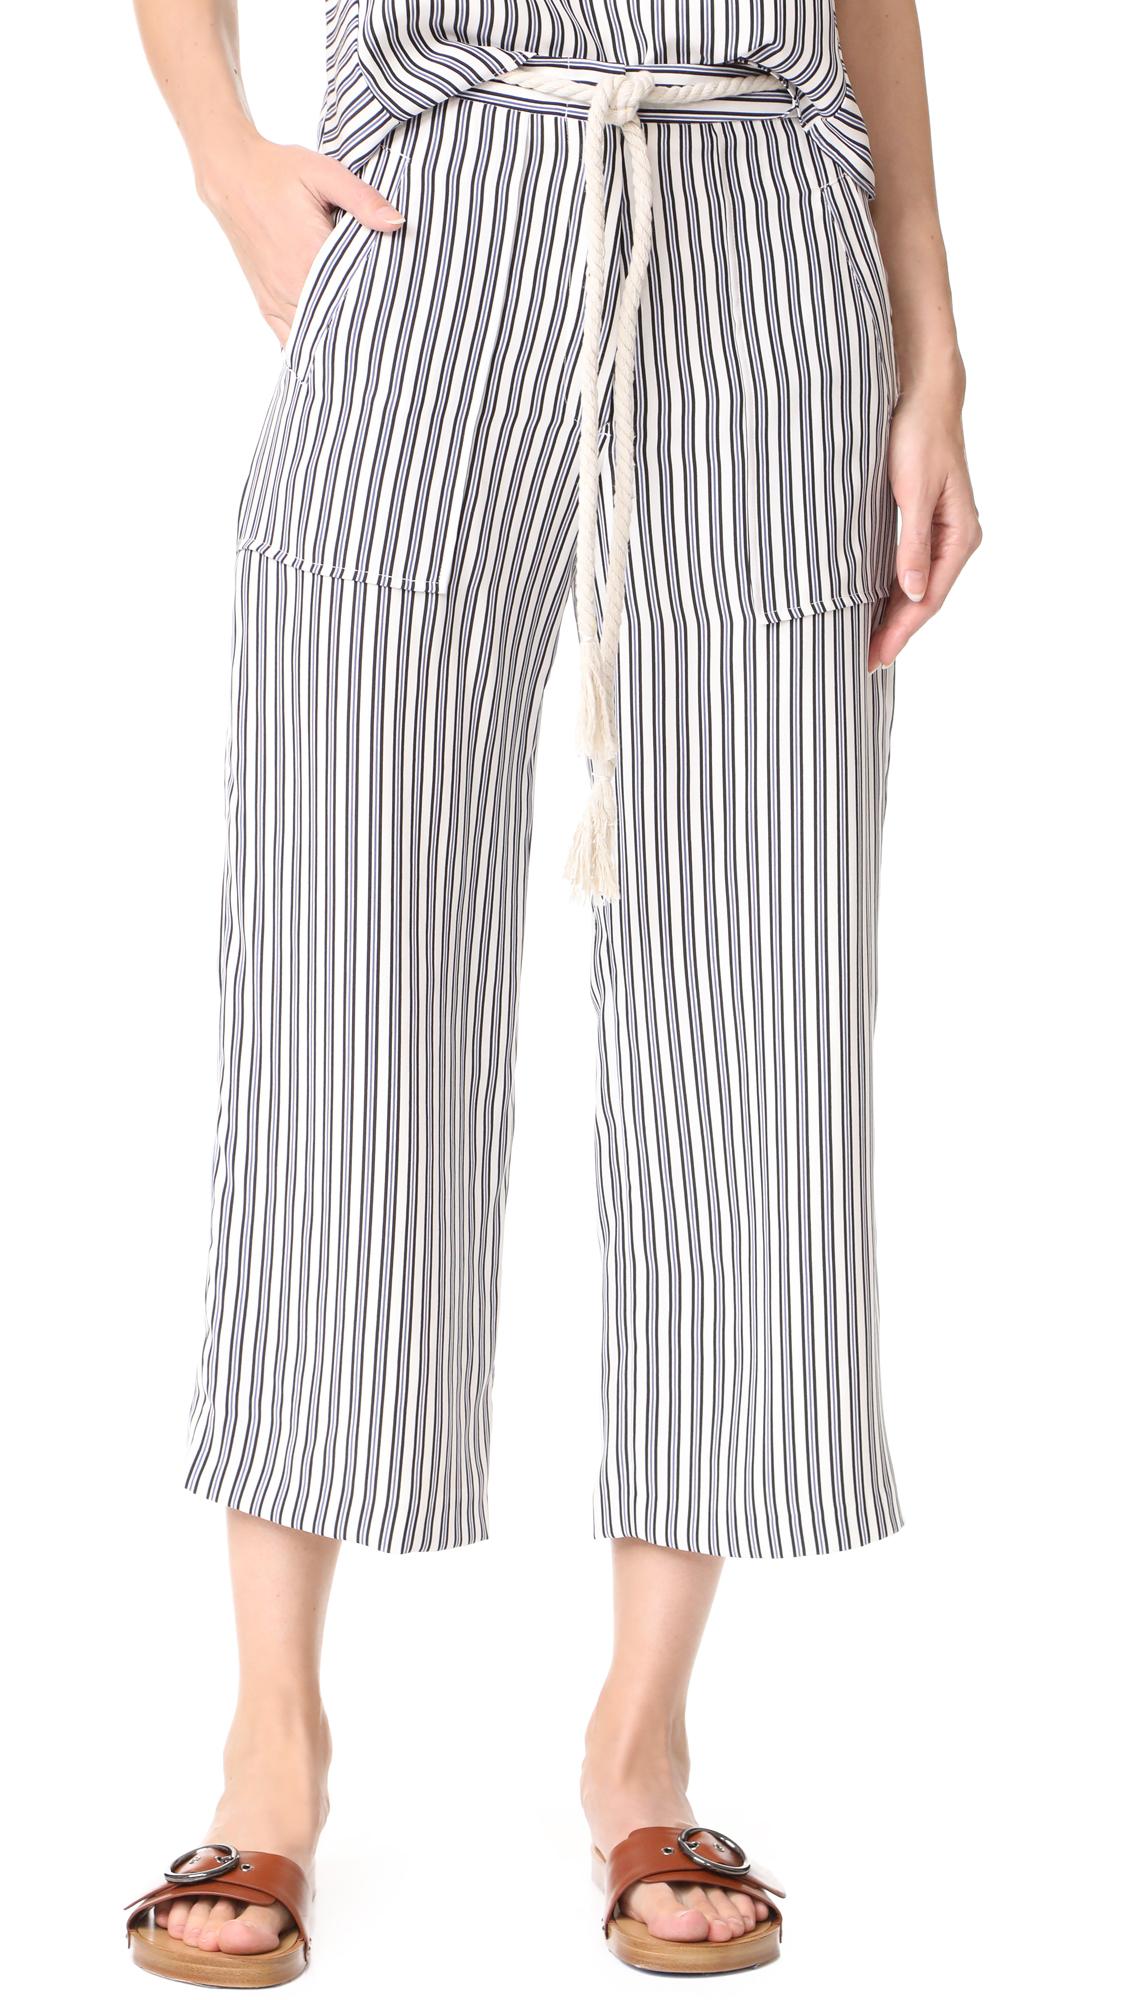 Jenni Kayne Drawstring Crop Pants - Ivory/Black/Blue